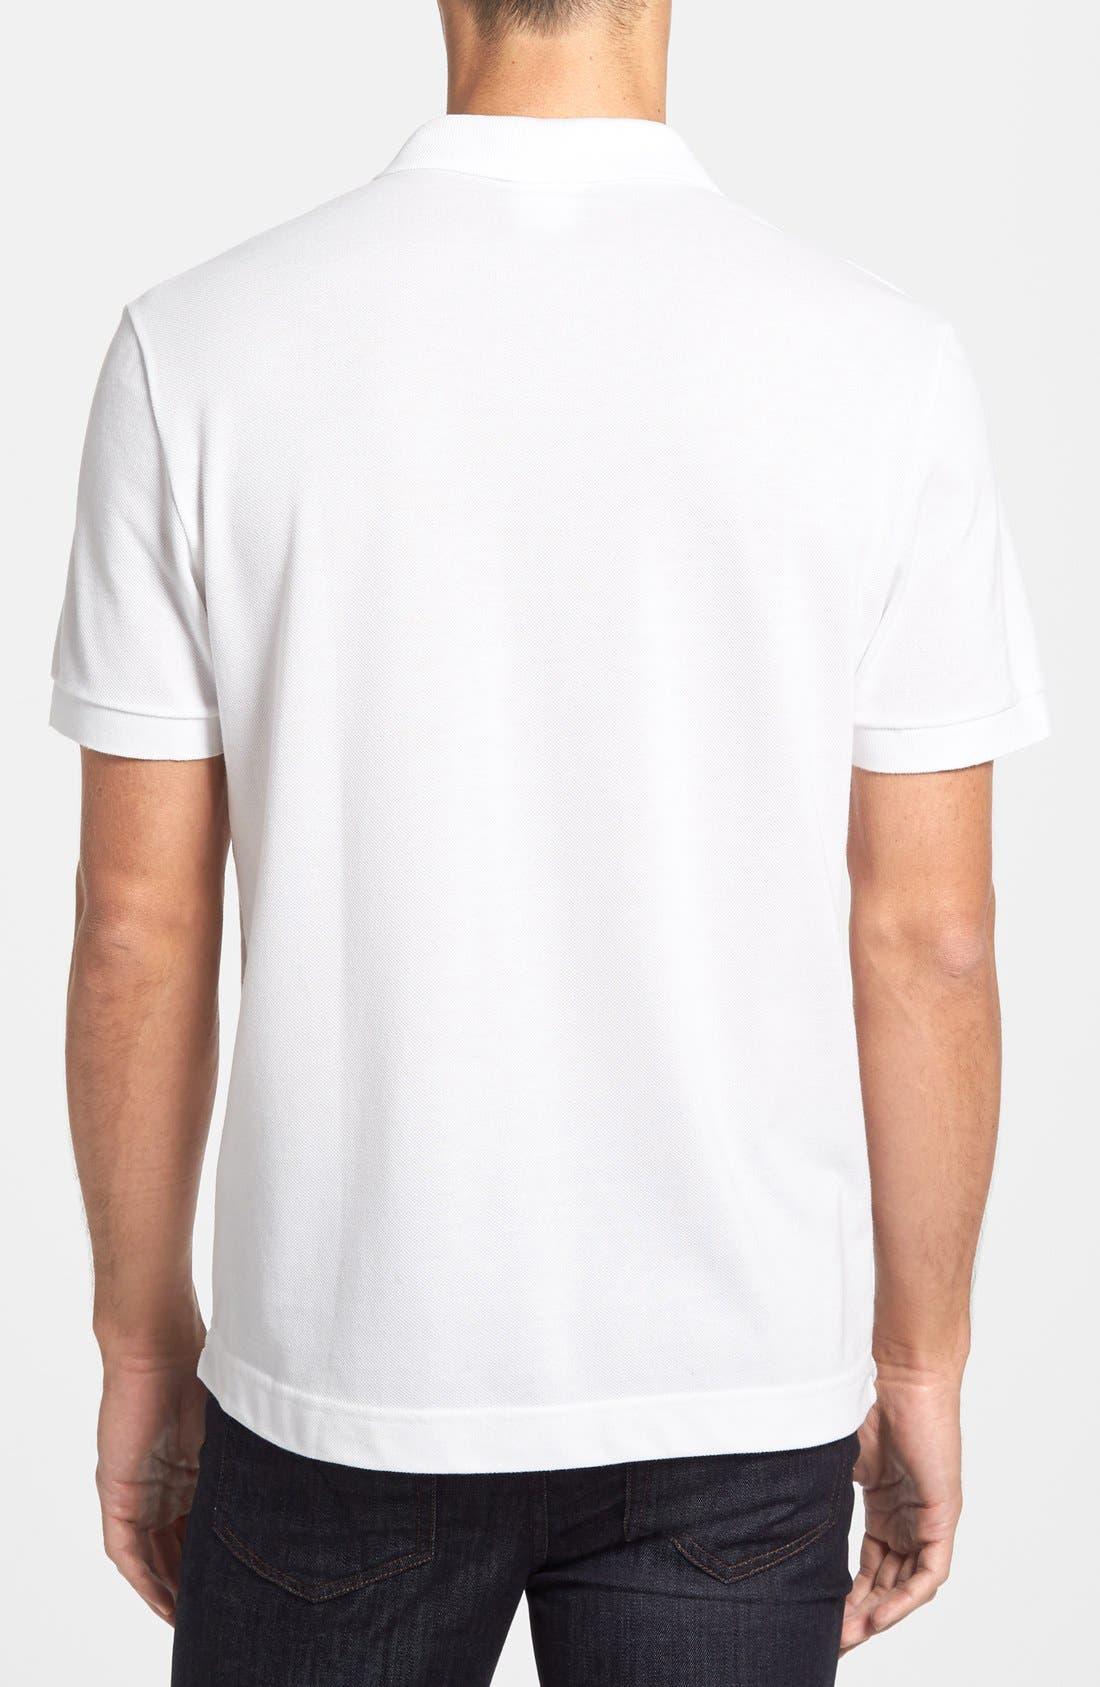 Alternate Image 2  - Lacoste 'White Croc' Regular Fit Piqué Polo